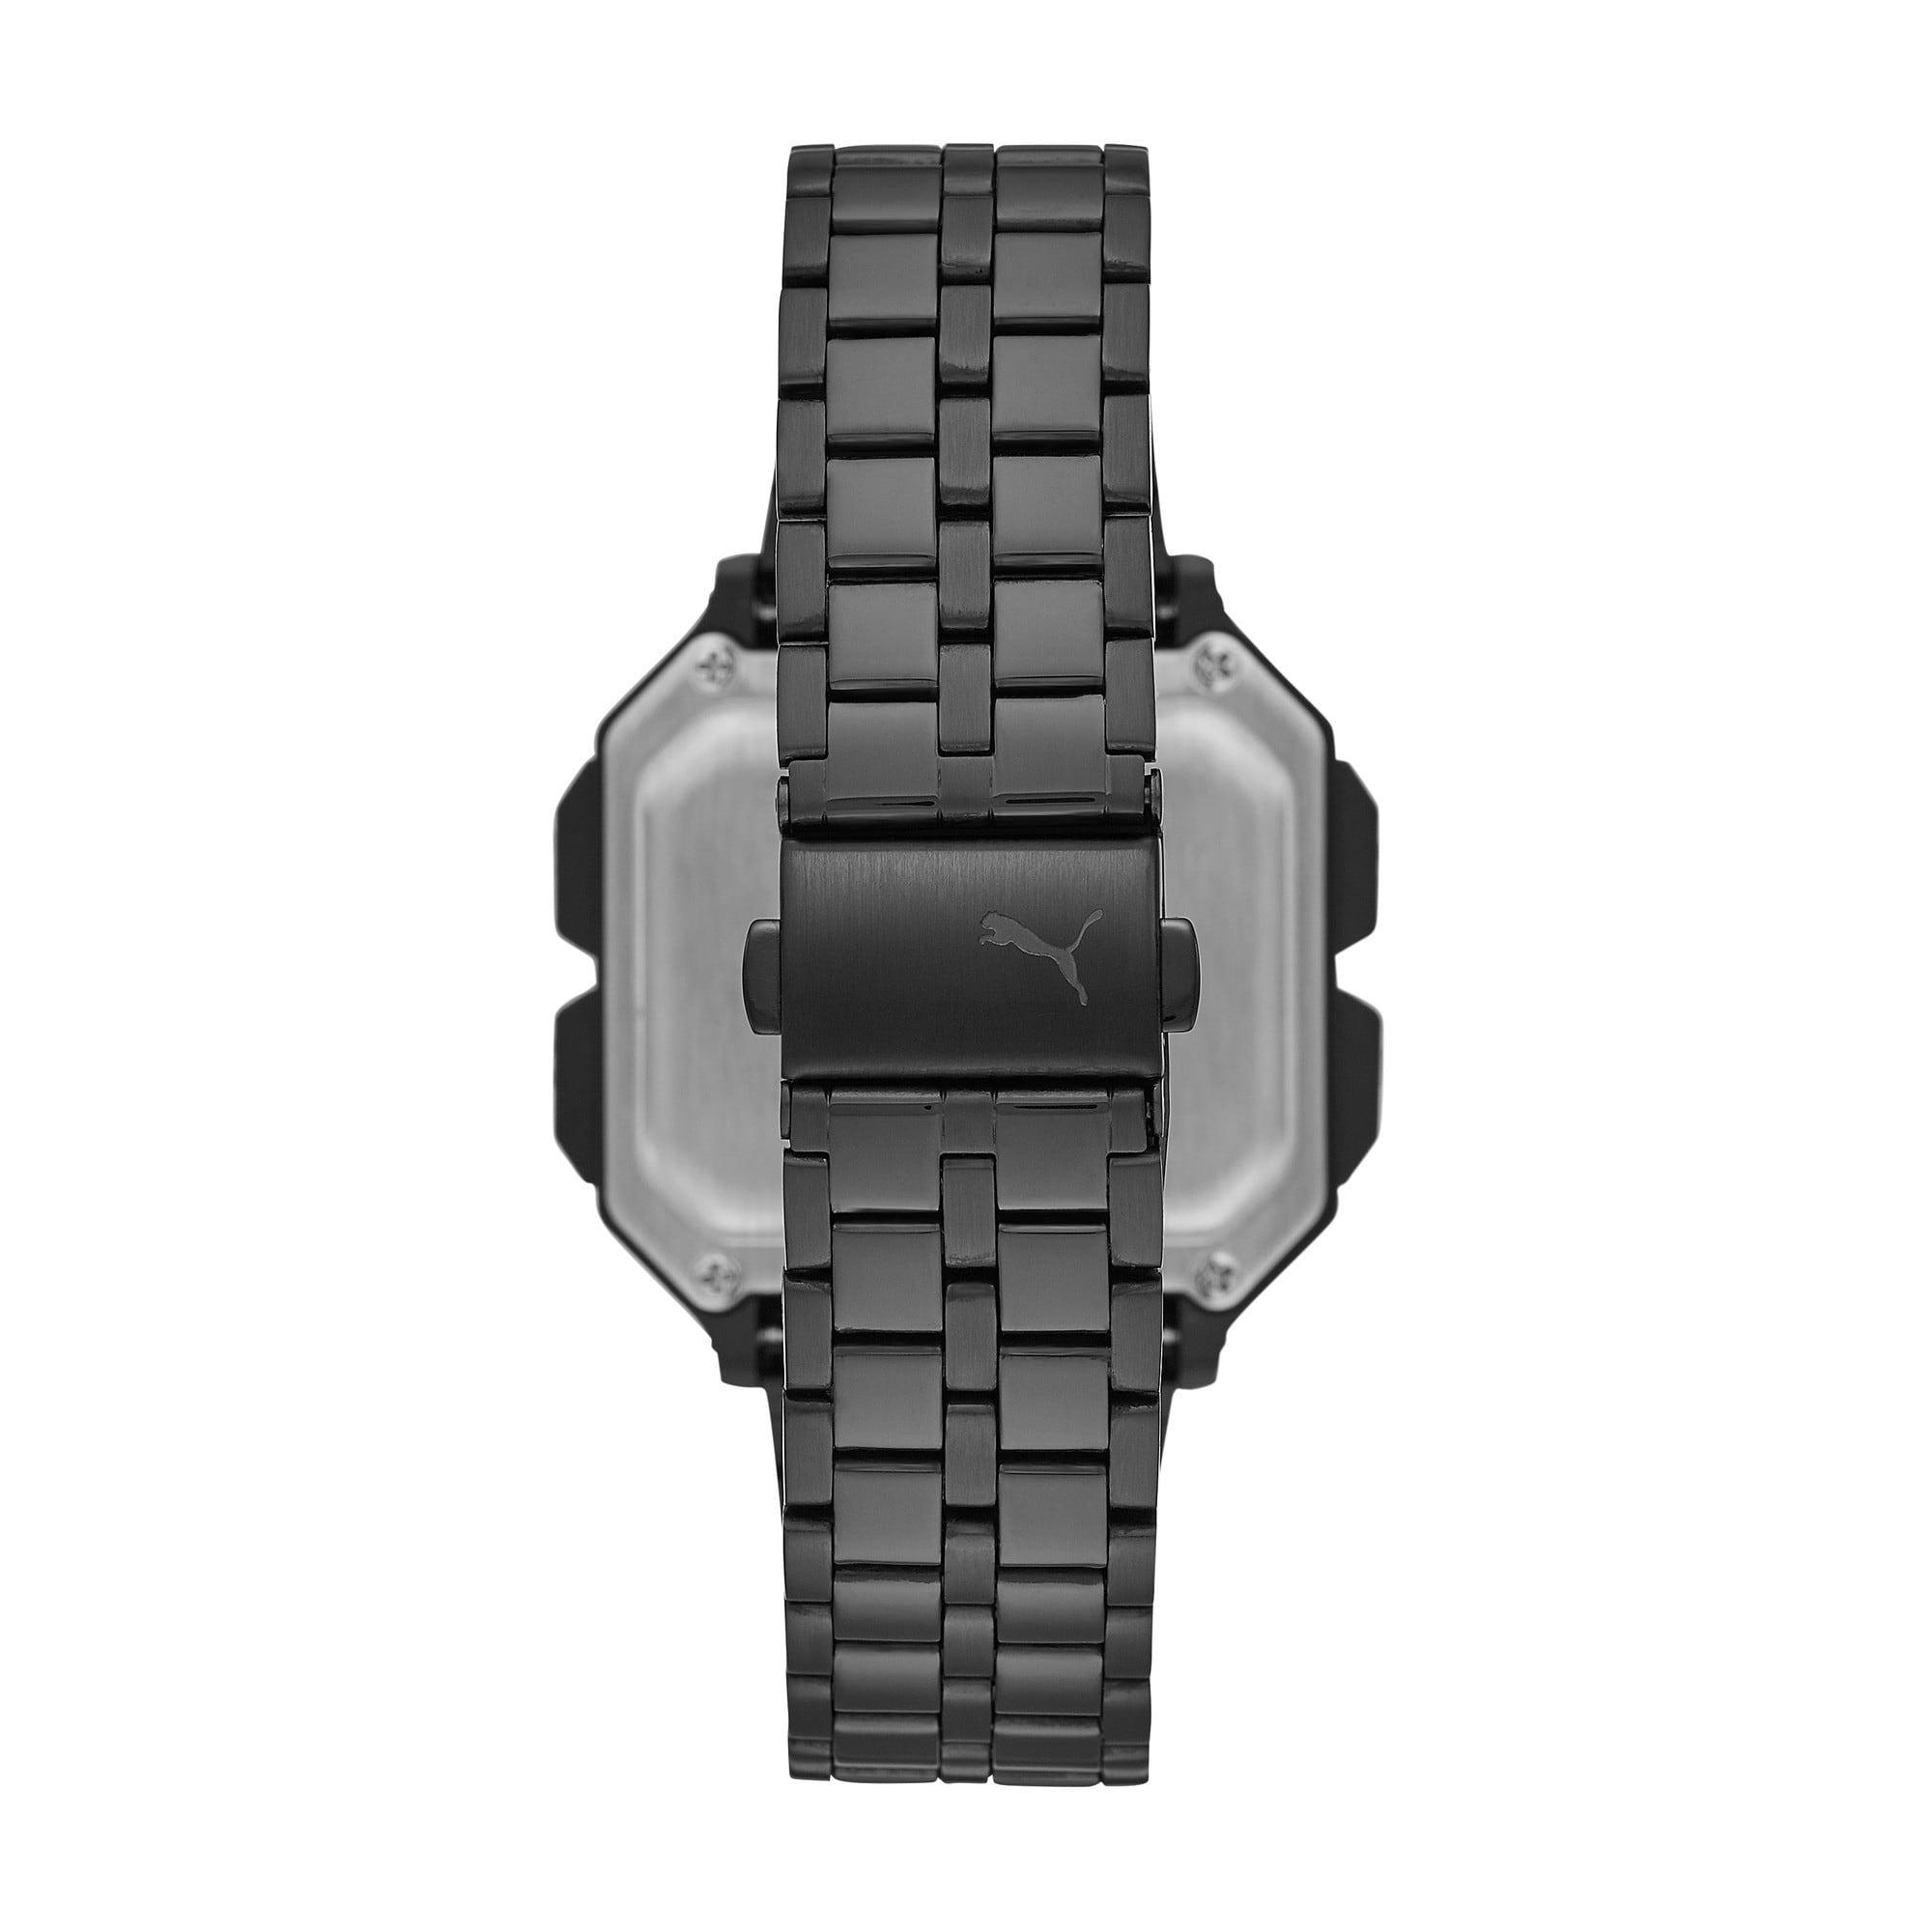 Thumbnail 2 of Remix Black Stainless Steel Digital Watch, Black/Black, medium